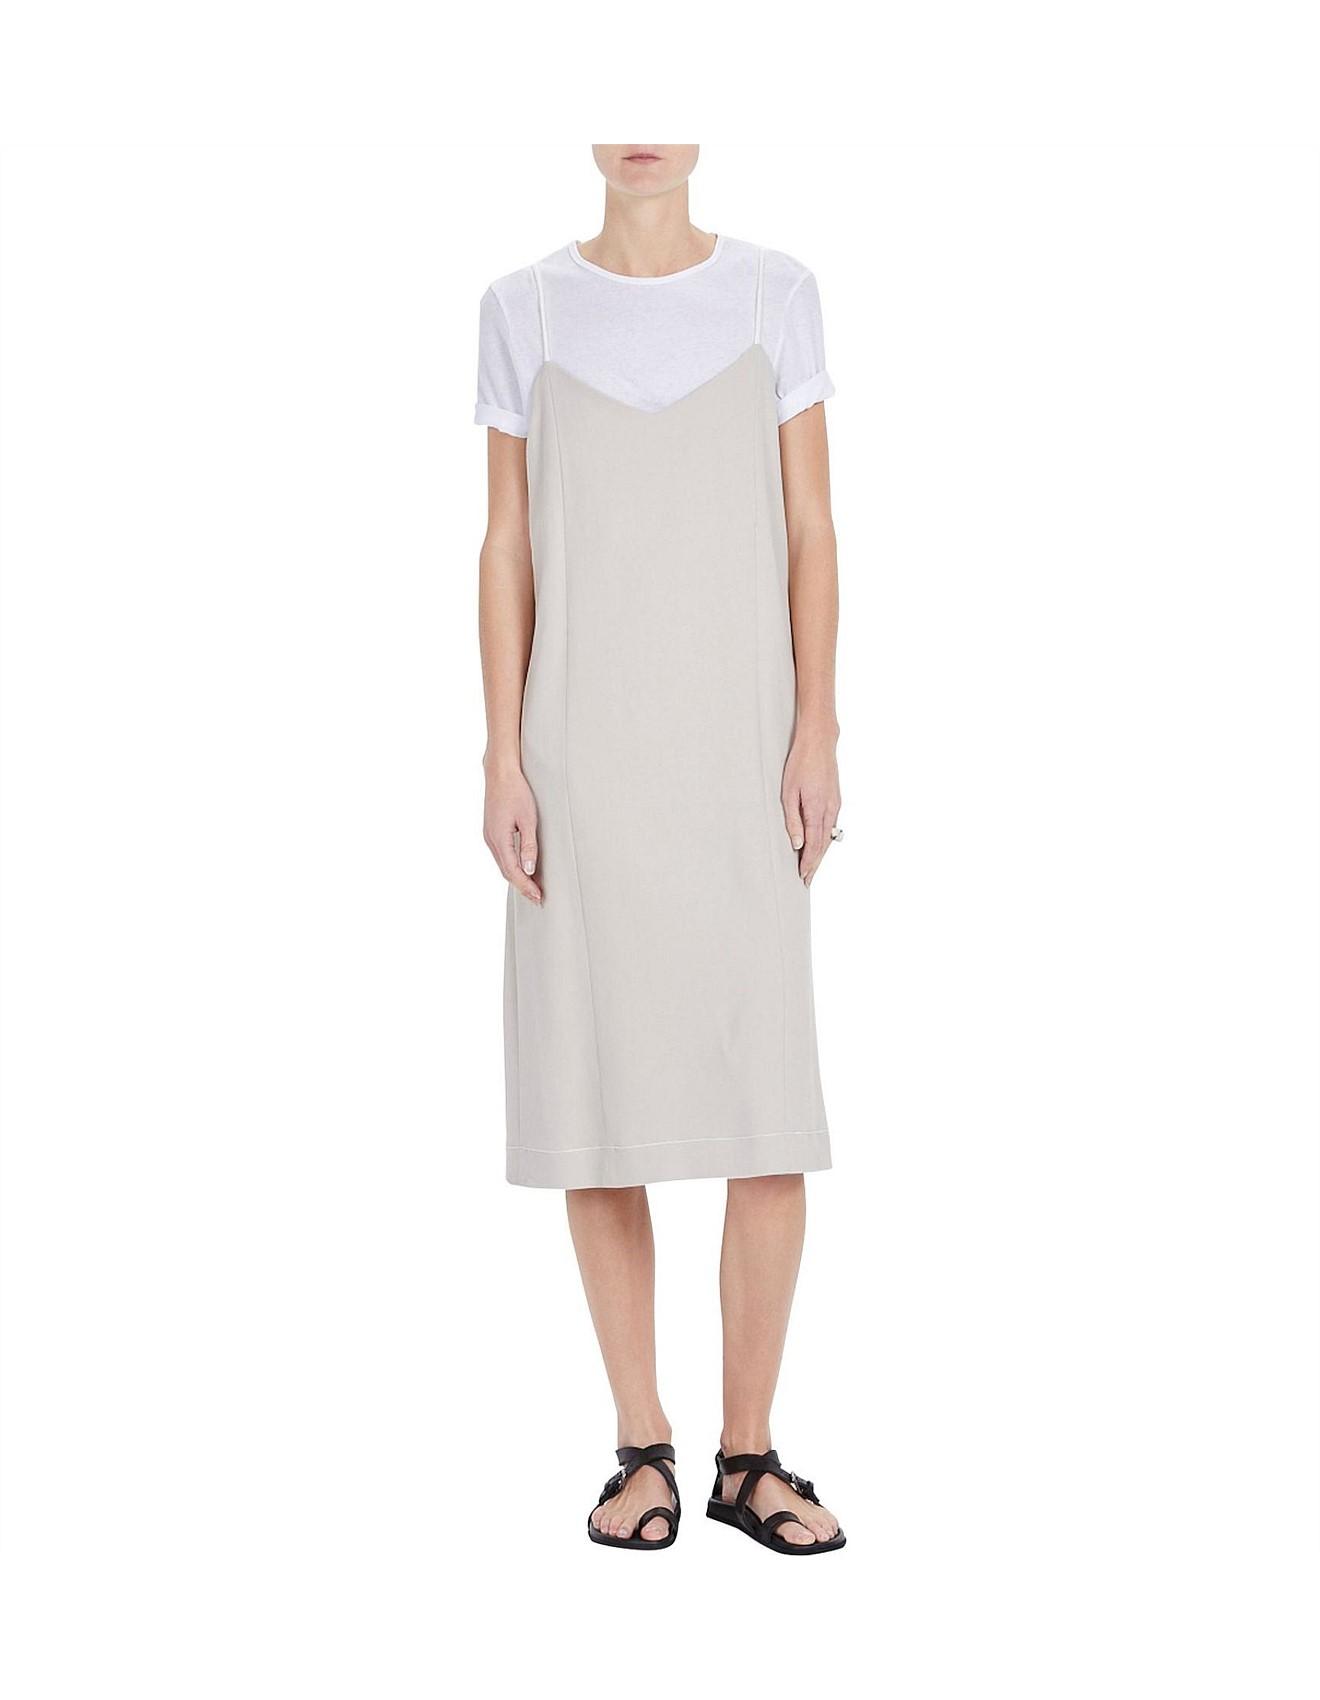 cca5e7d5d Viscose Twill Drawstring Dress